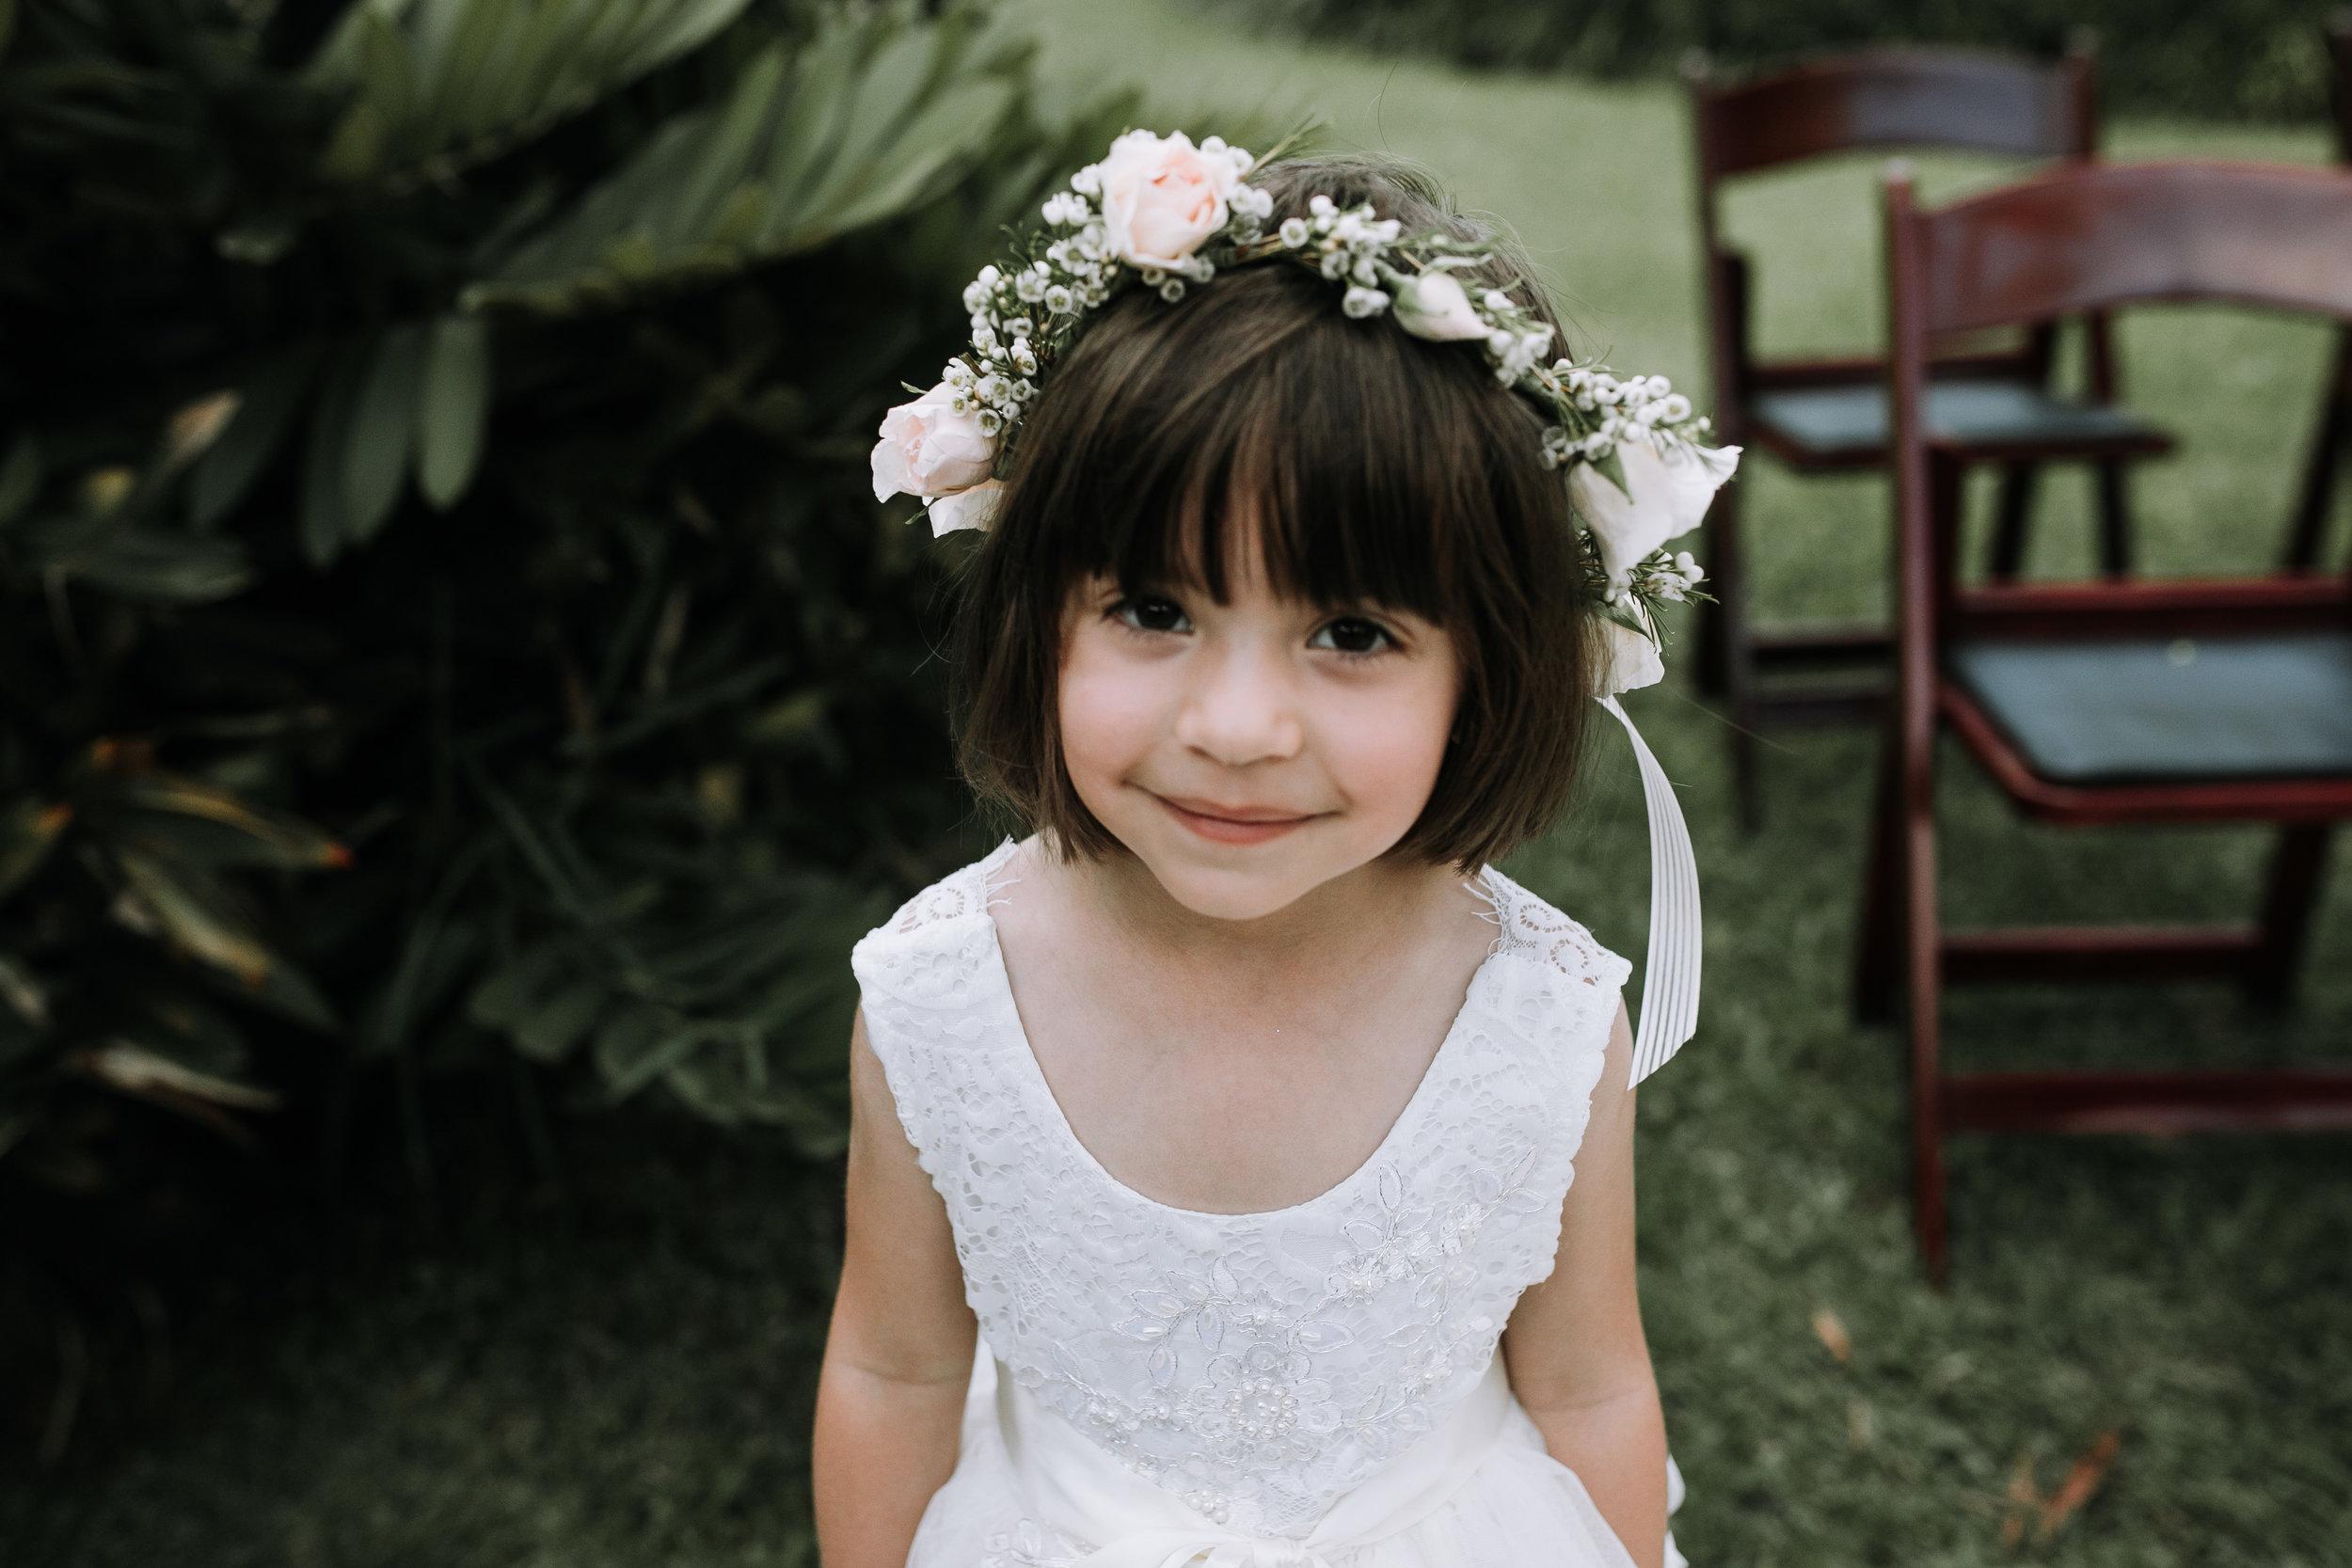 south-florida-wedding-flower-girl